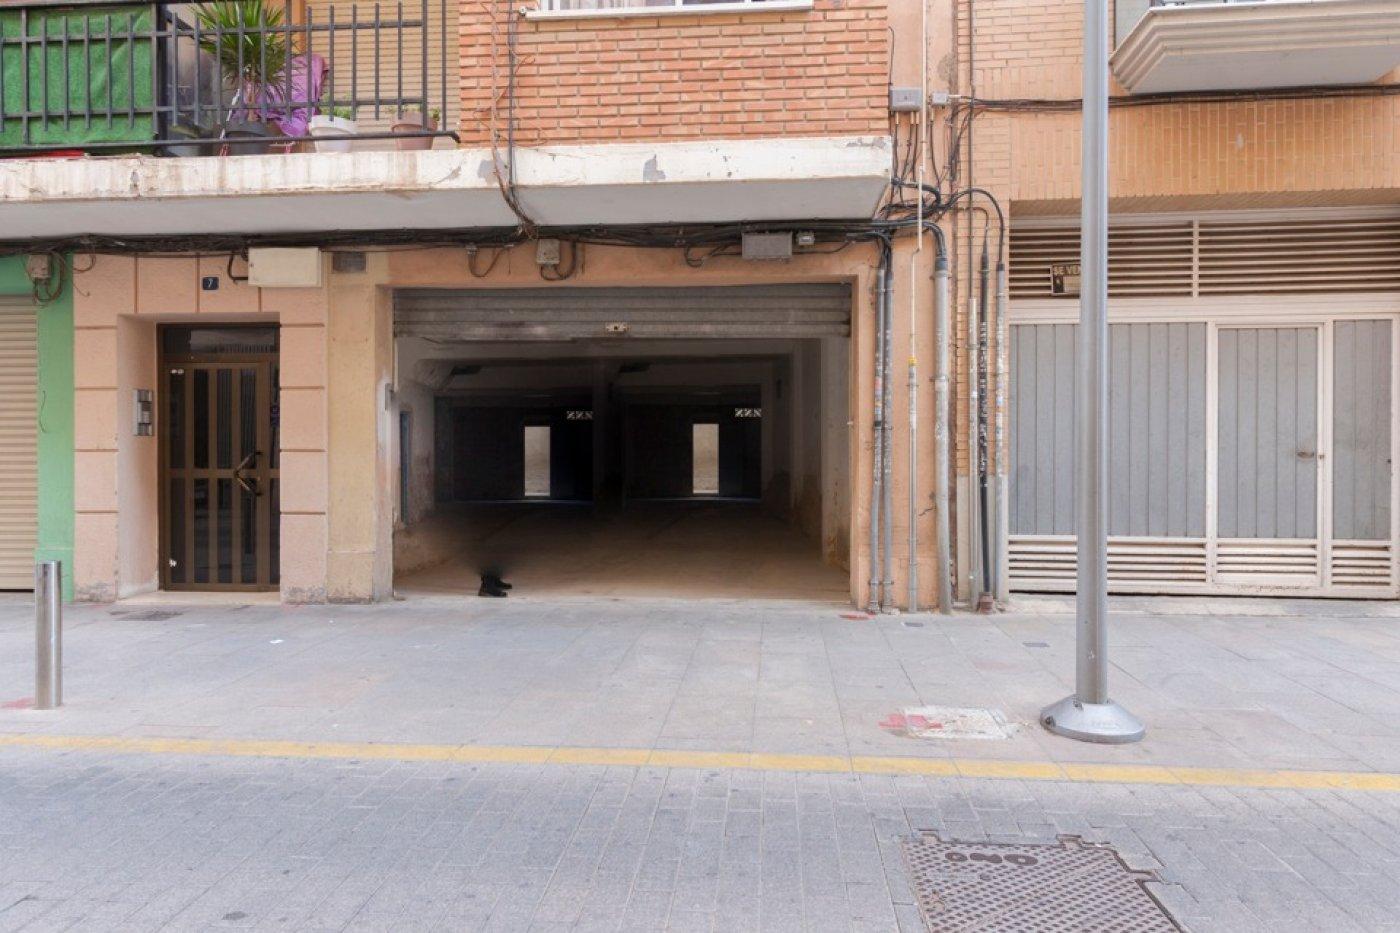 local-comercial en torrent · estacion-metro-vieja 250€